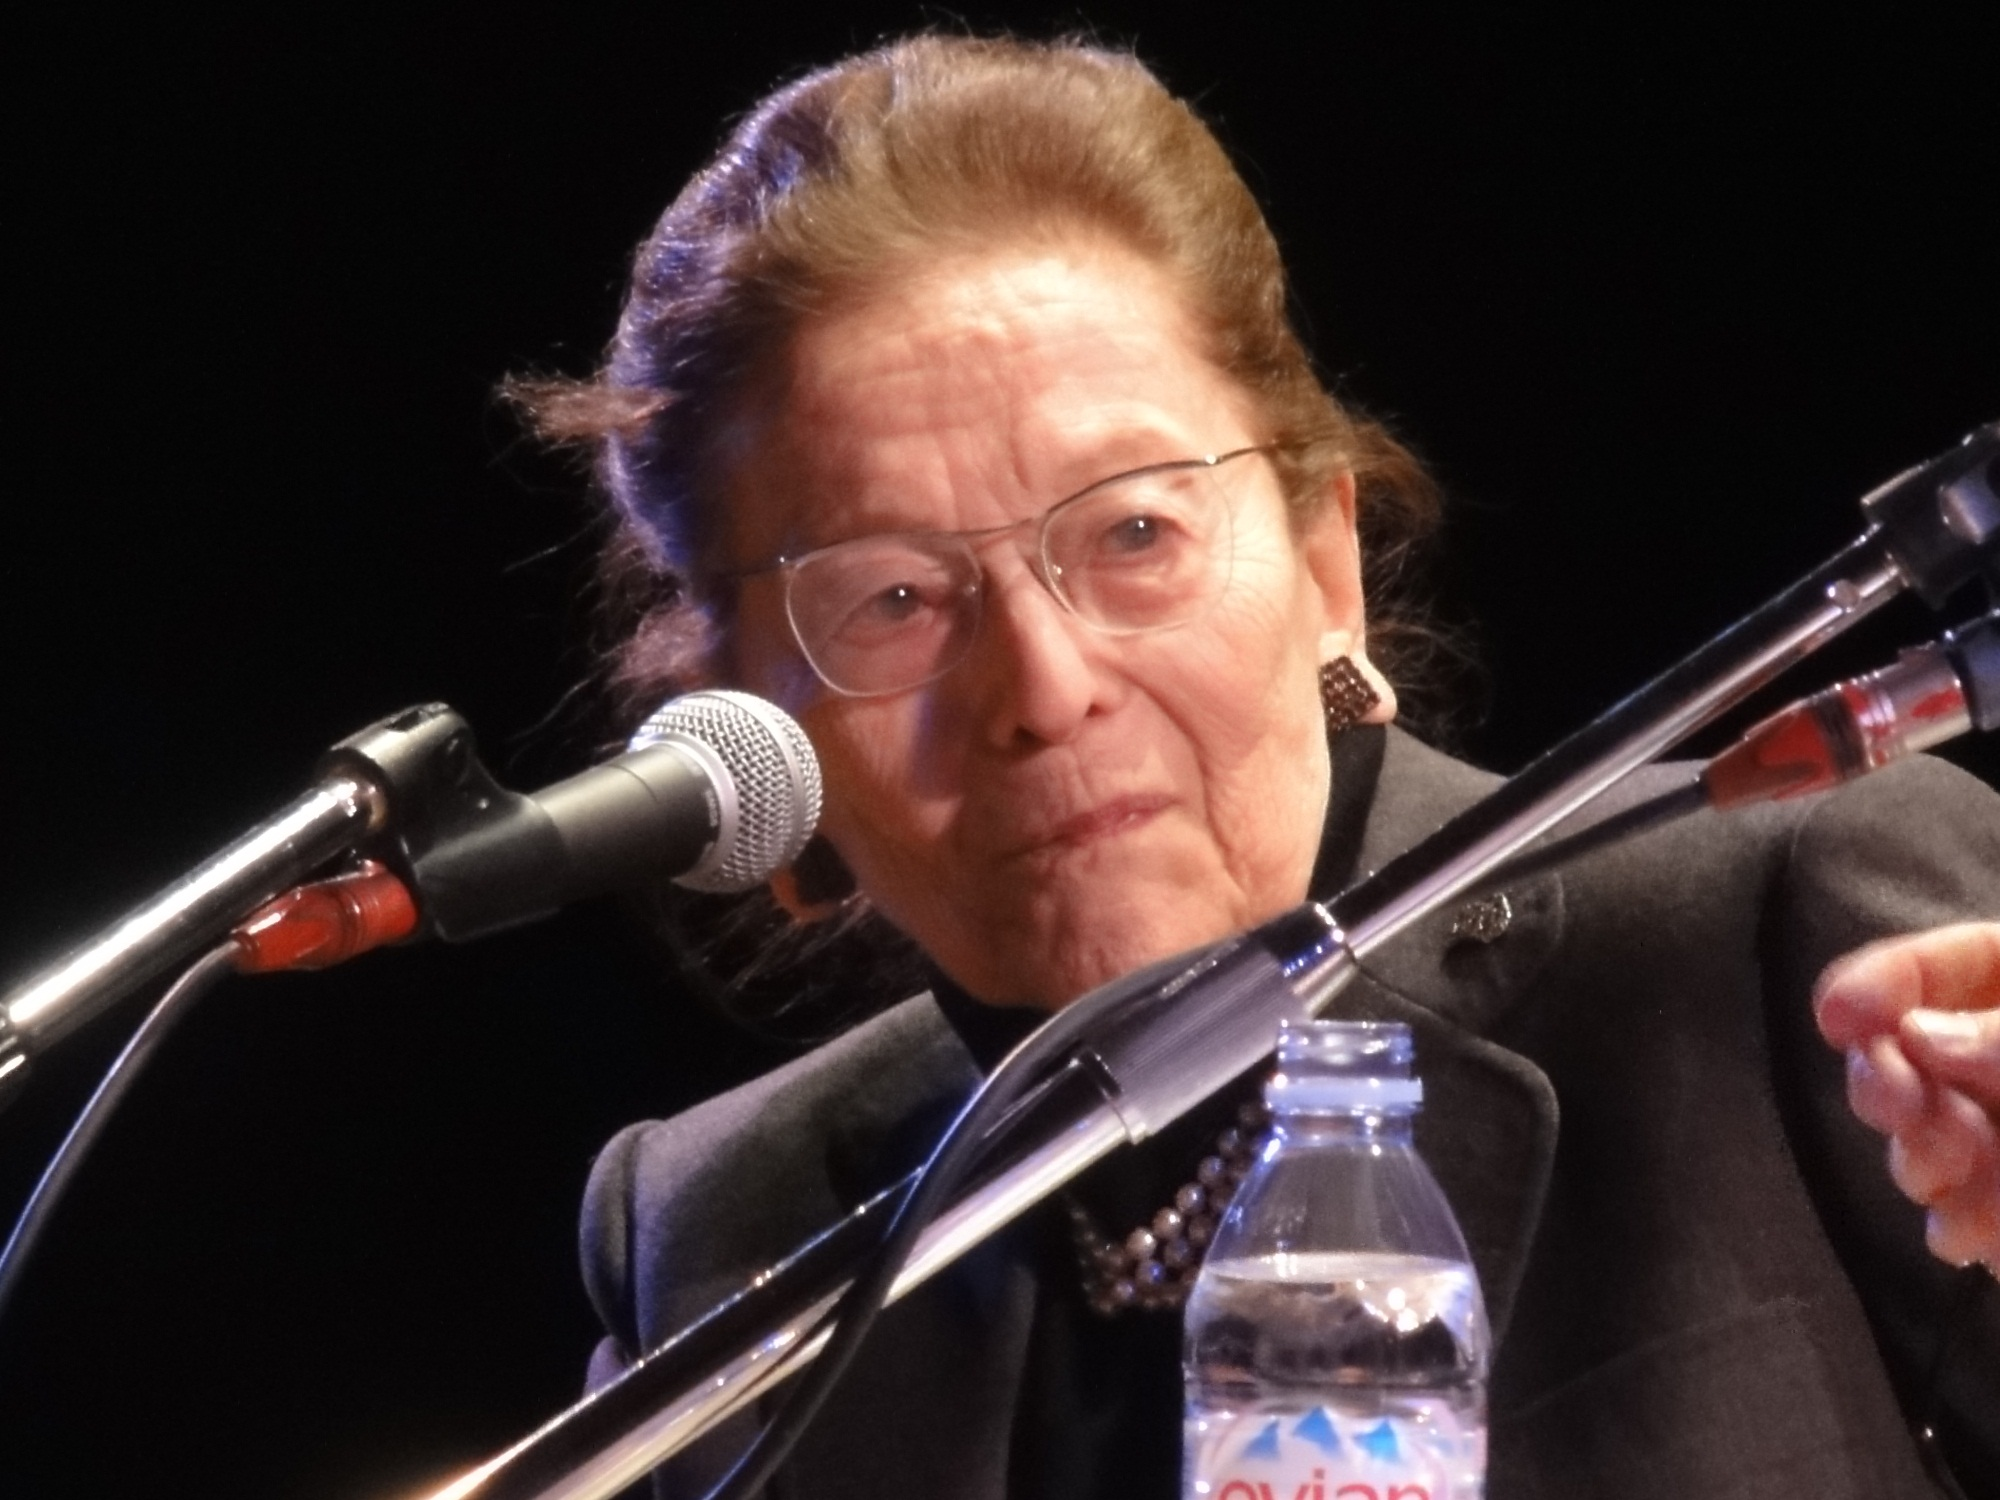 Edmonde Charles-Roux in 2011